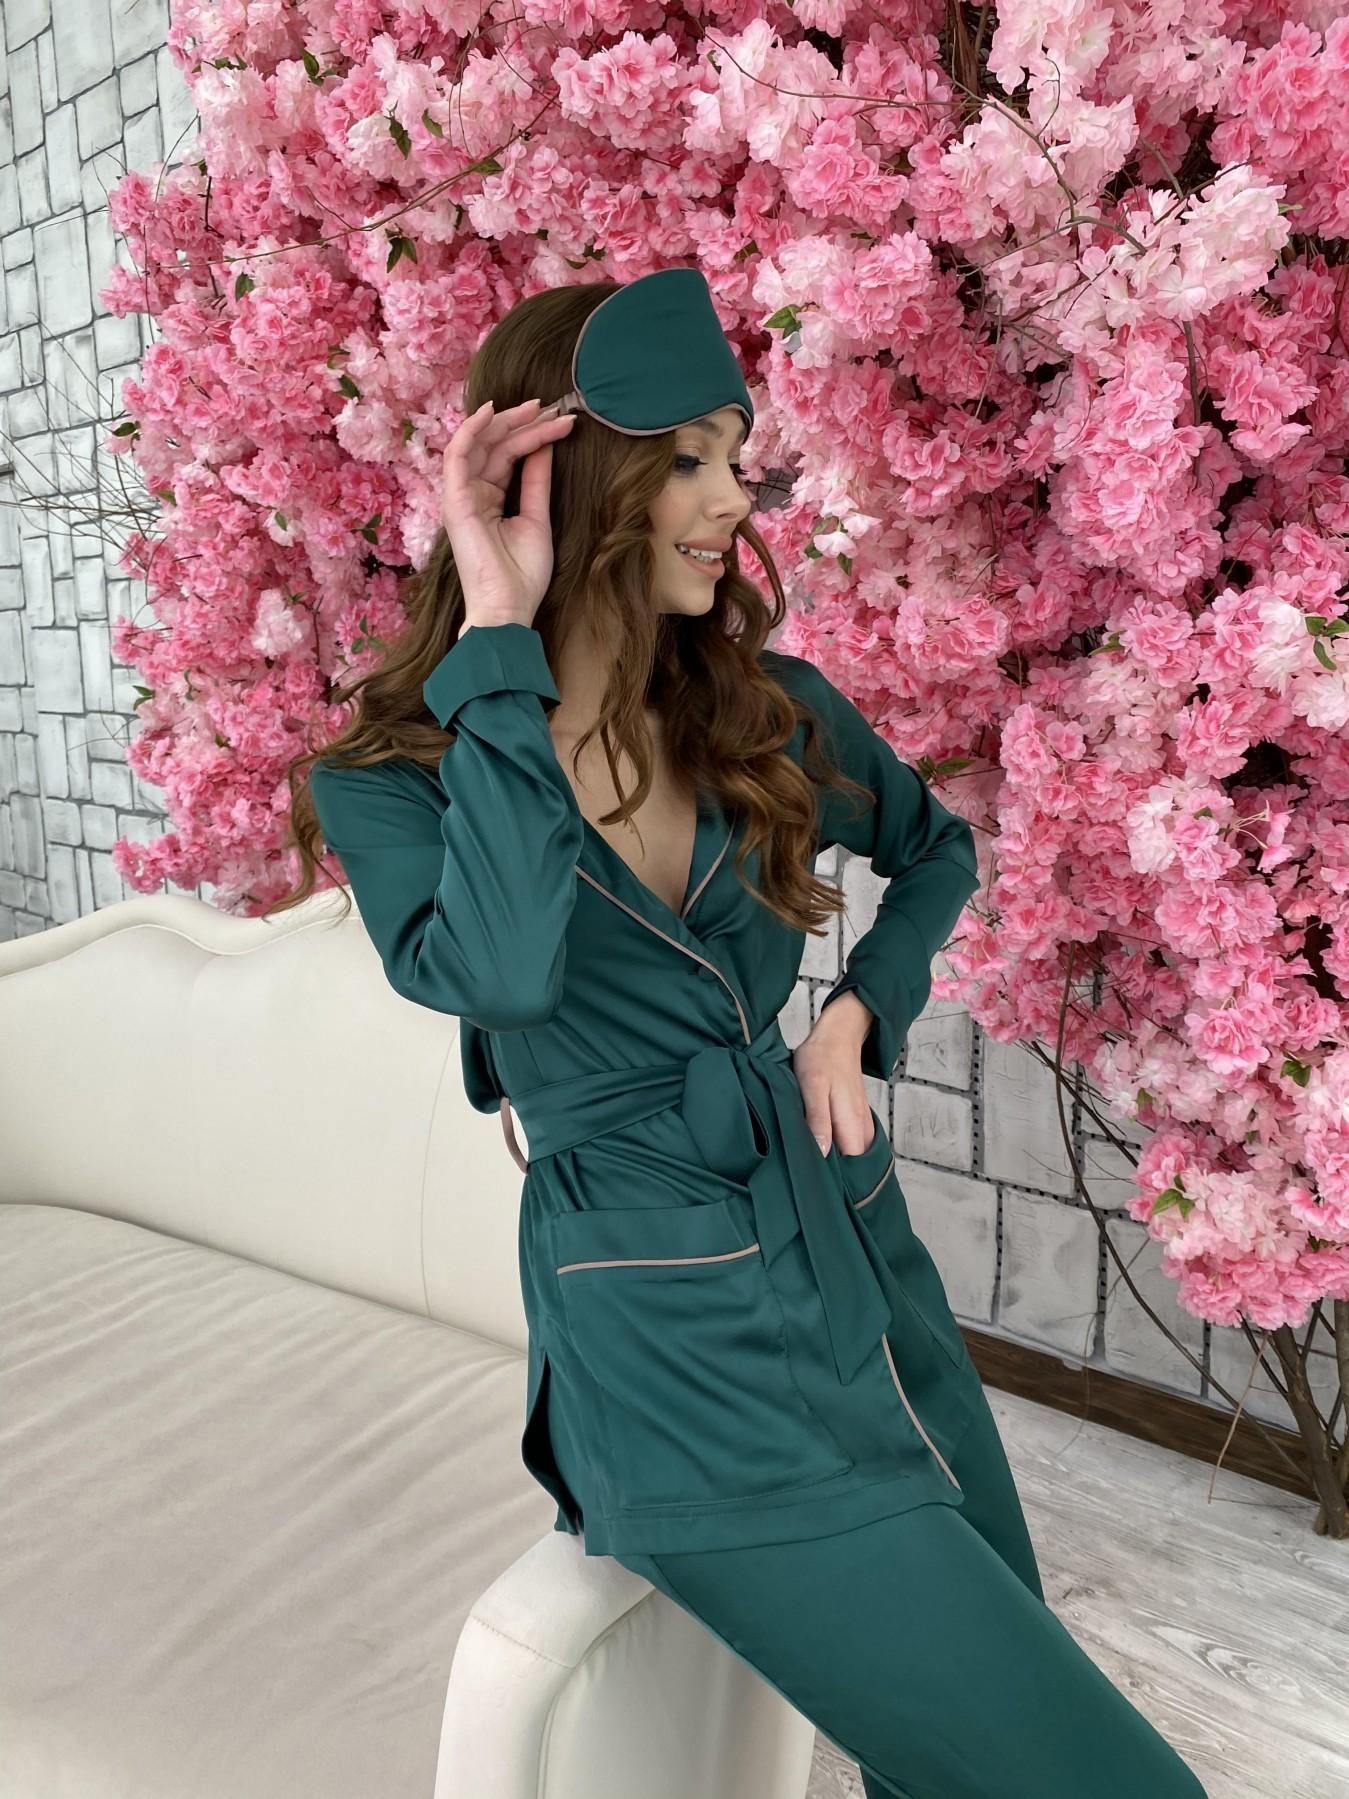 Шайн костюм из шелка  10778 АРТ. 47212 Цвет: Темно зеленый - фото 2, интернет магазин tm-modus.ru